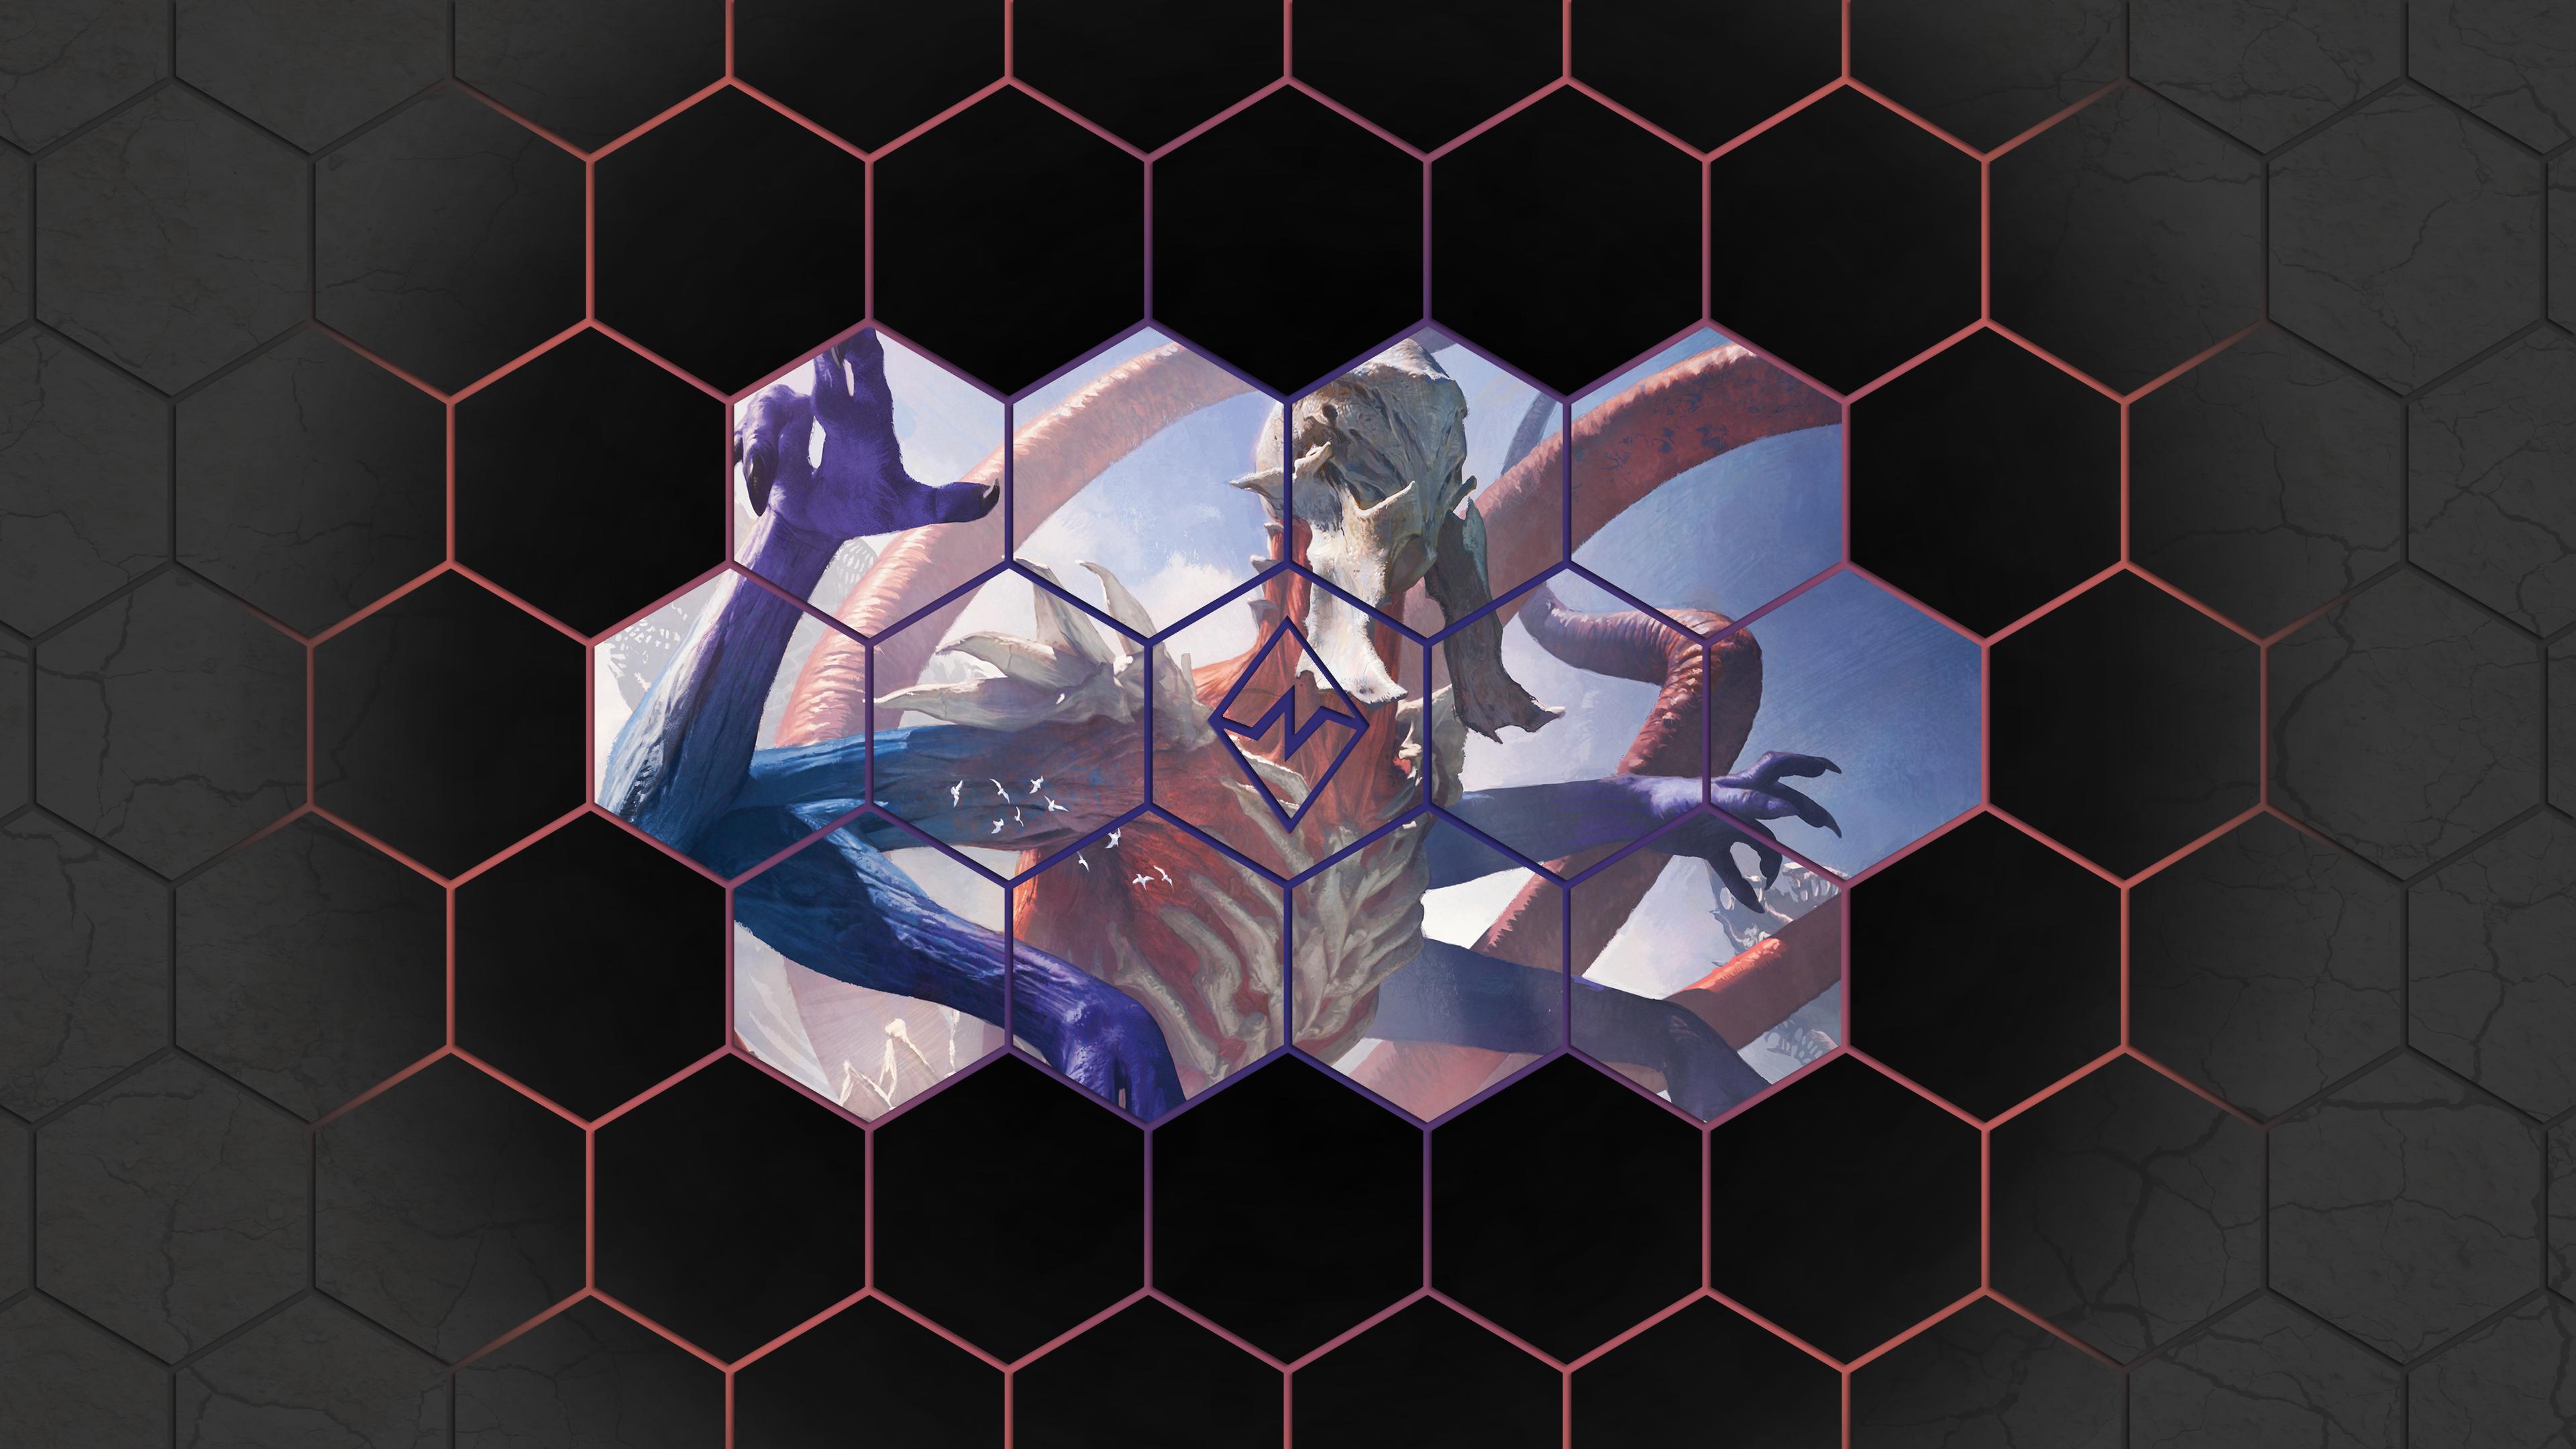 Hexagon Mtg Ulamog The Ceaseless Hunger C By Locix Ita On